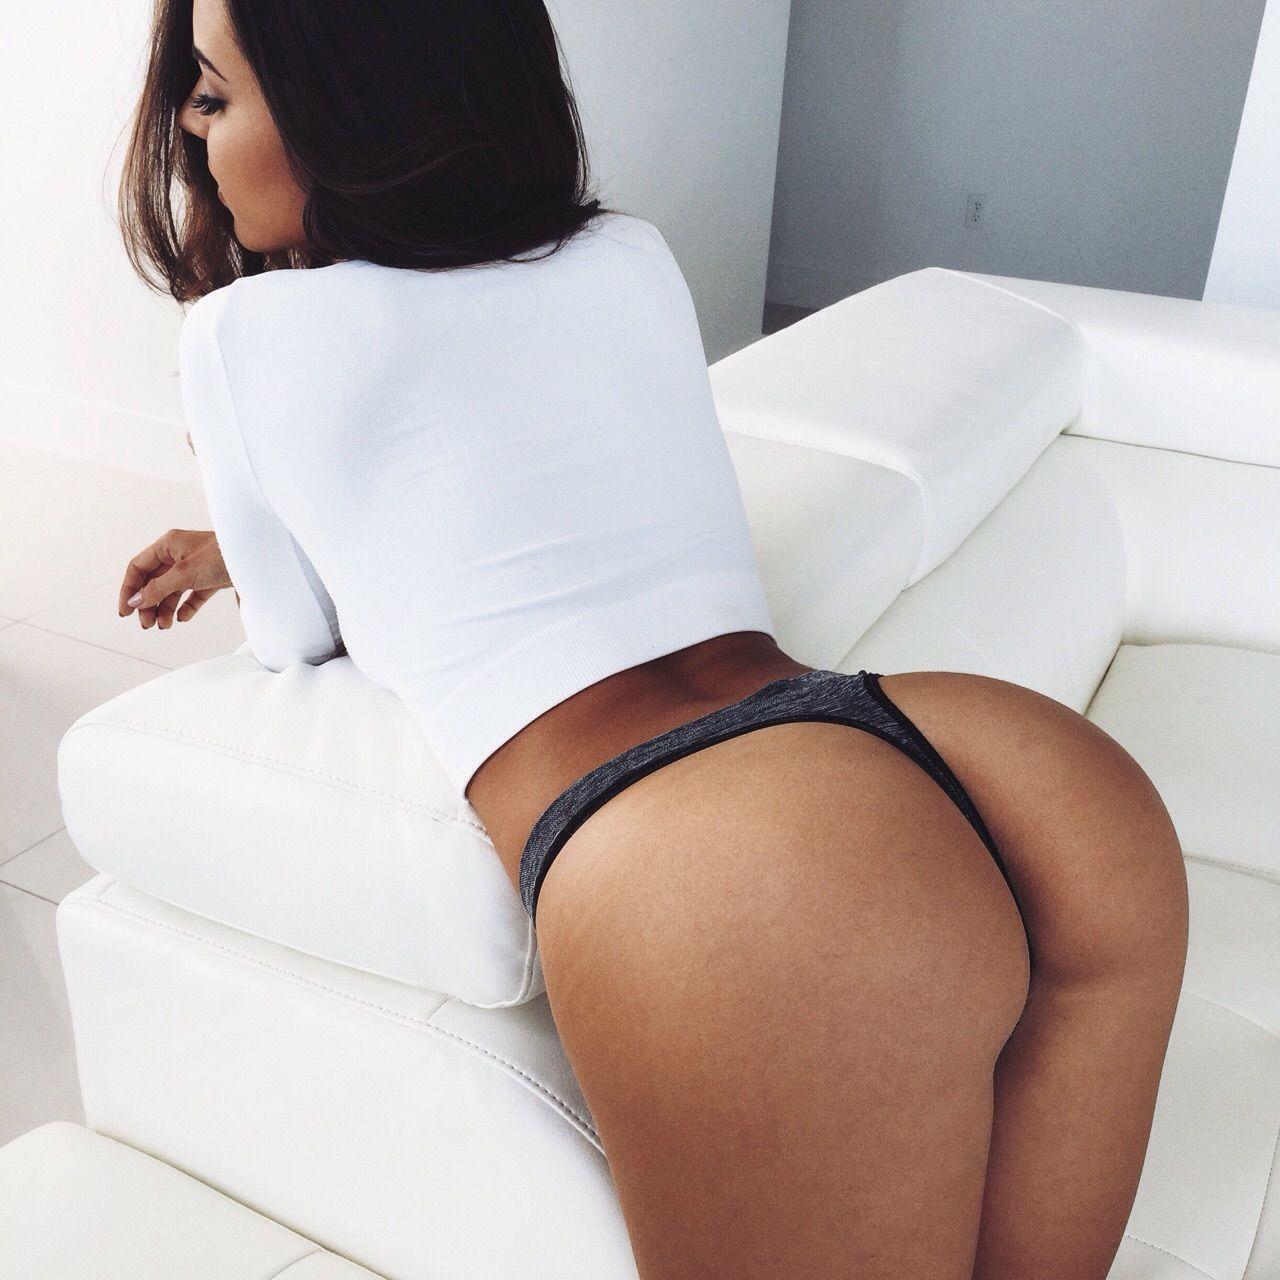 Hot latina with perfect big booty, porno arab turki jerman